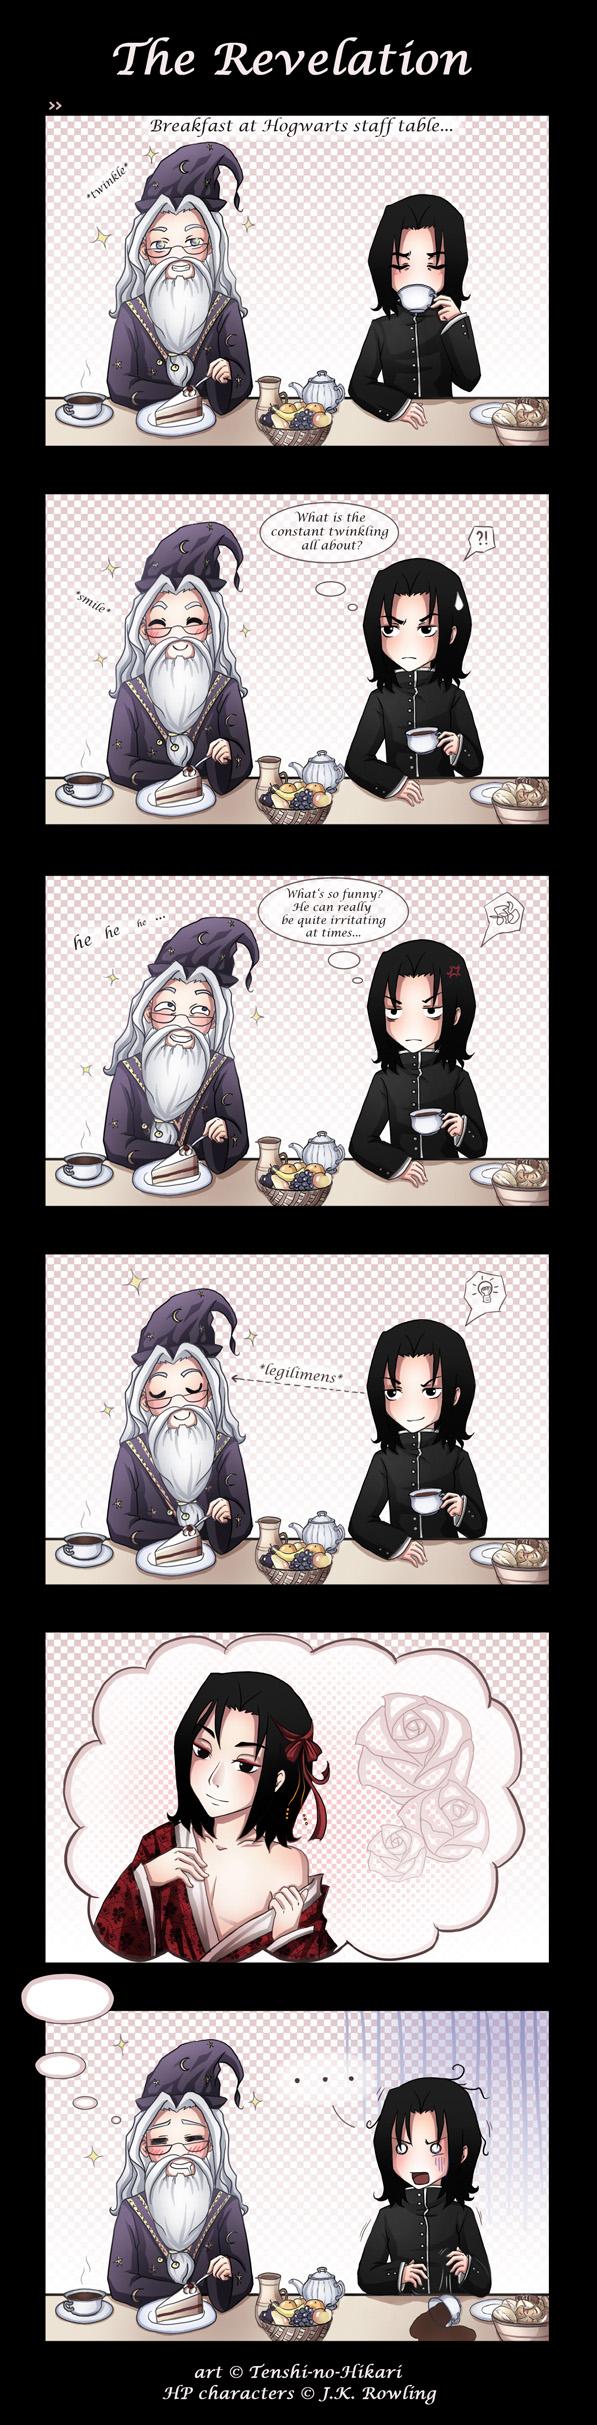 HP - The revelation by Tenshi-no-Hikari